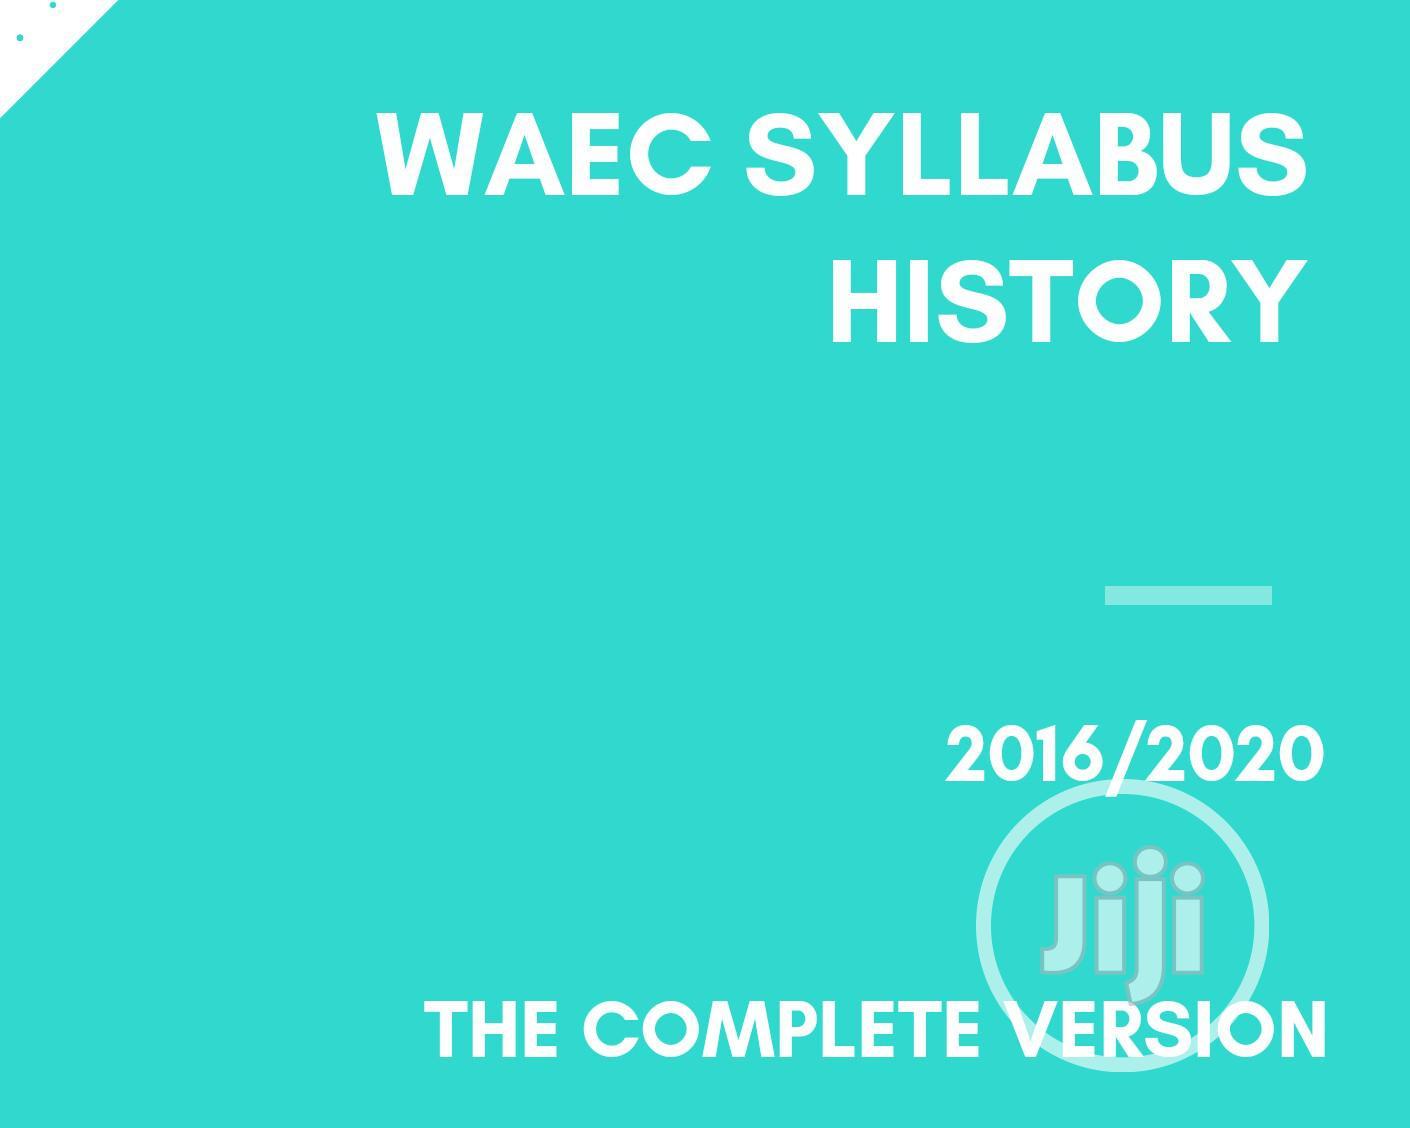 Archive: WAEC Syllabus: History